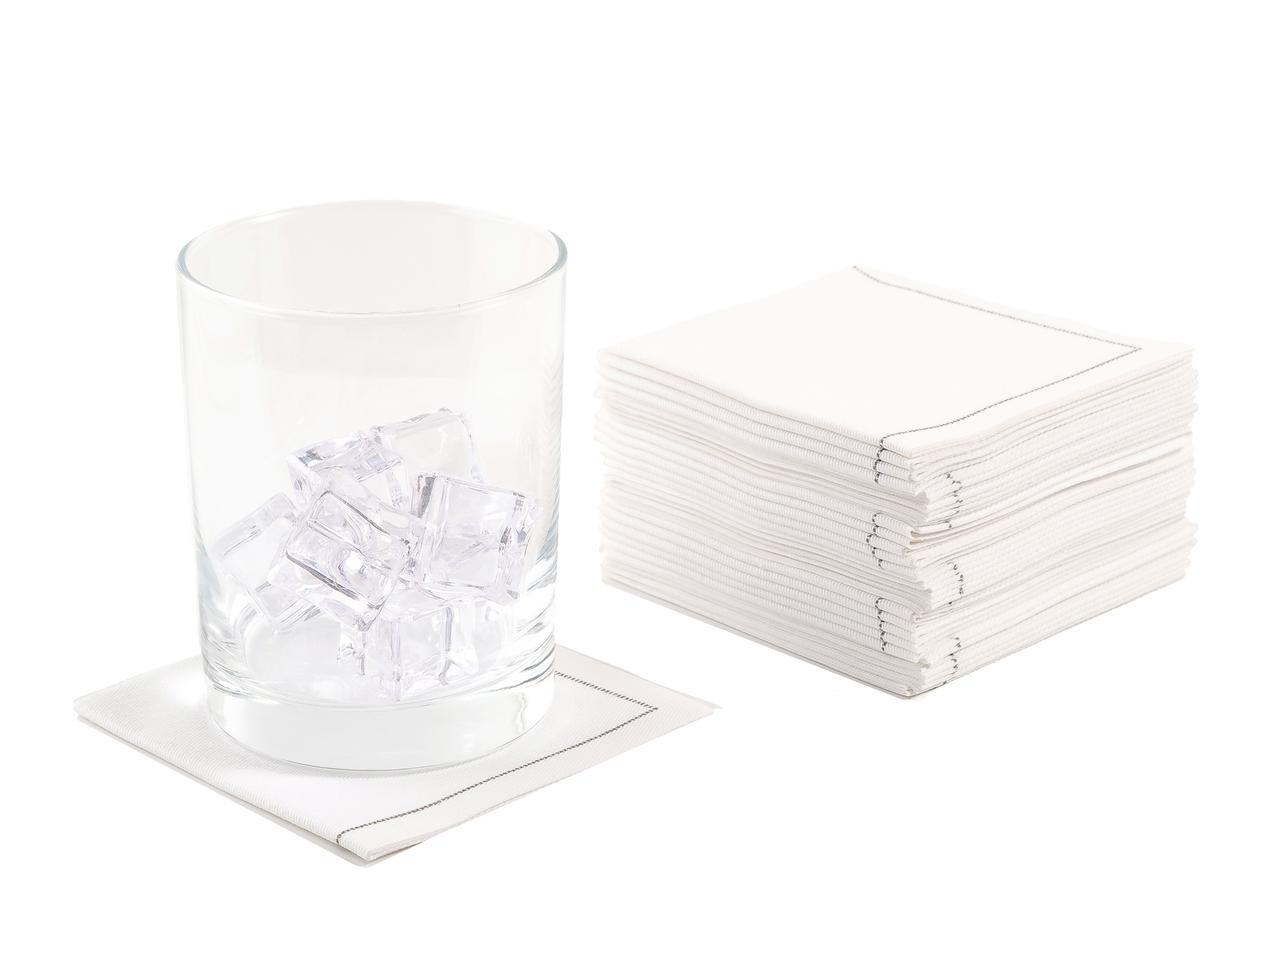 "White Cotton 1/4 Fold Cocktail Premium (180 GSM) - 8"" x 8"" (folded 4"" x 4"") - 600 units"